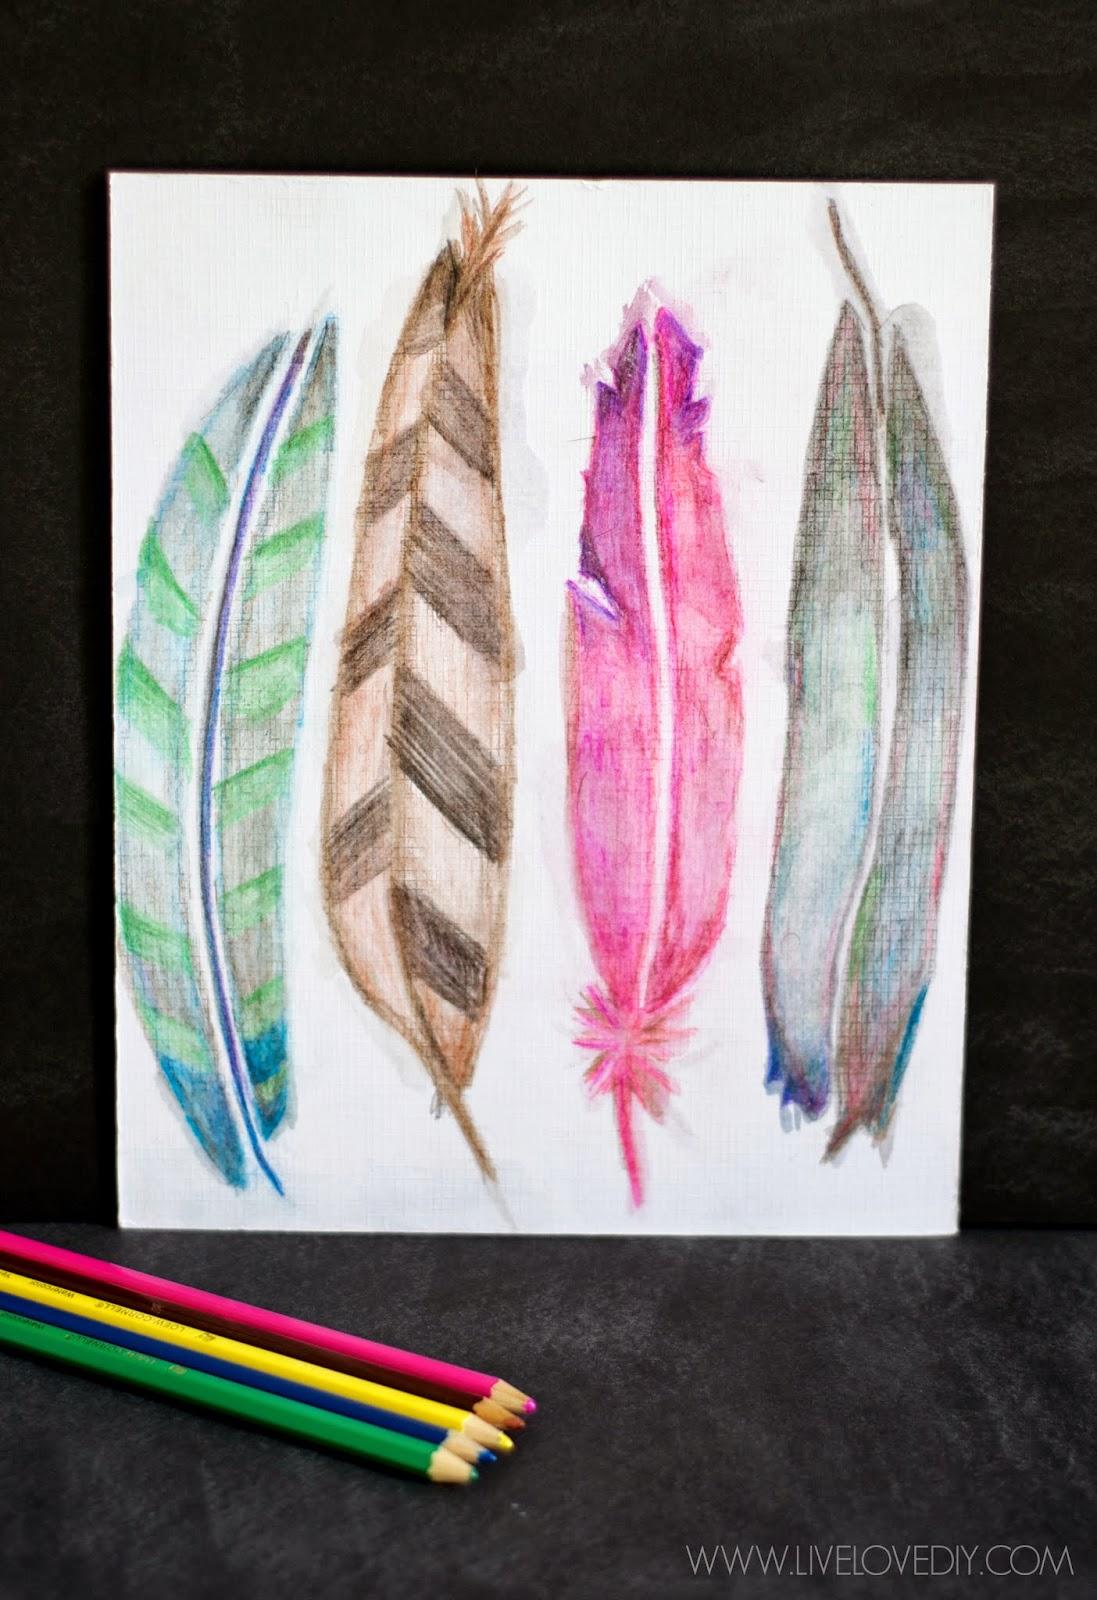 livelovediy how to use watercolor pencils aka my favorite new way to make art